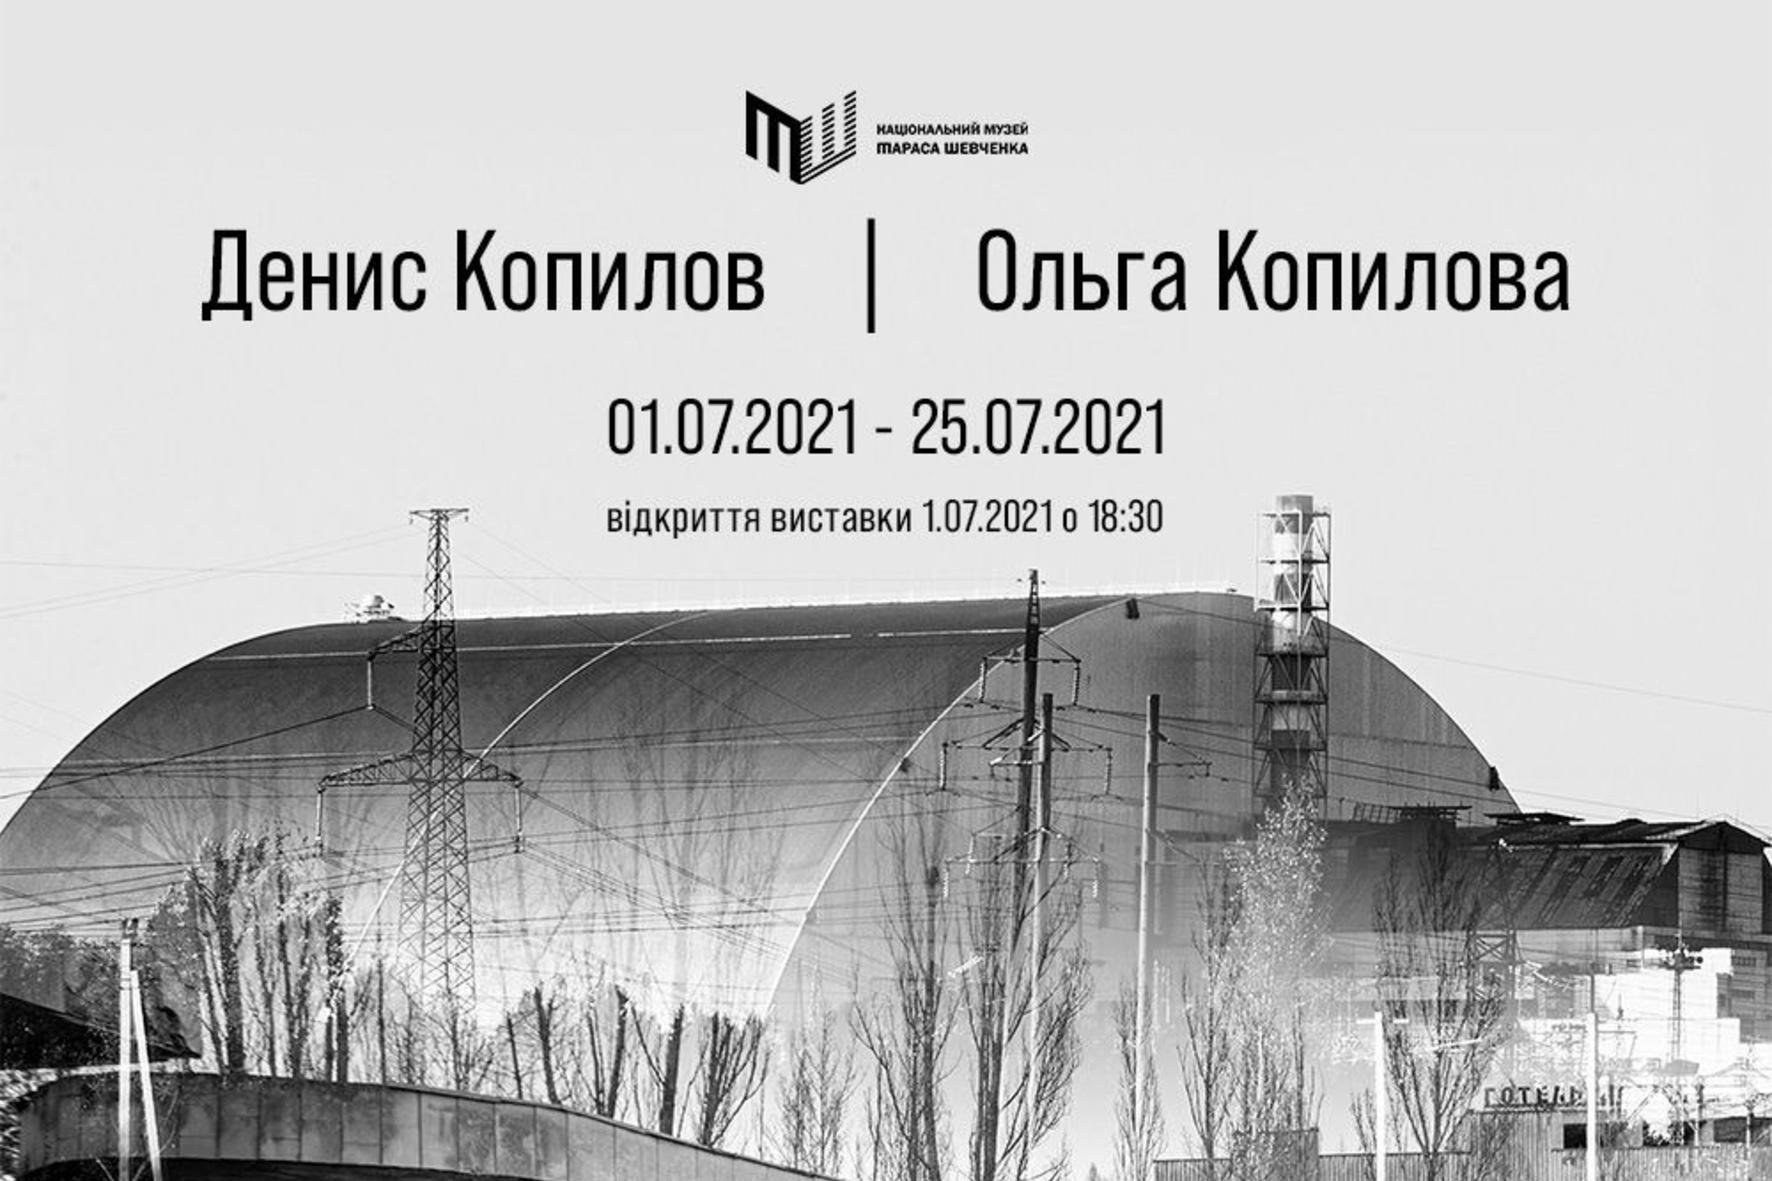 Денис Копылов. КОВЧЕГ «ЧОРНОБИЛЬ»: ПЕРЕЗАВАНТАЖЕННЯ